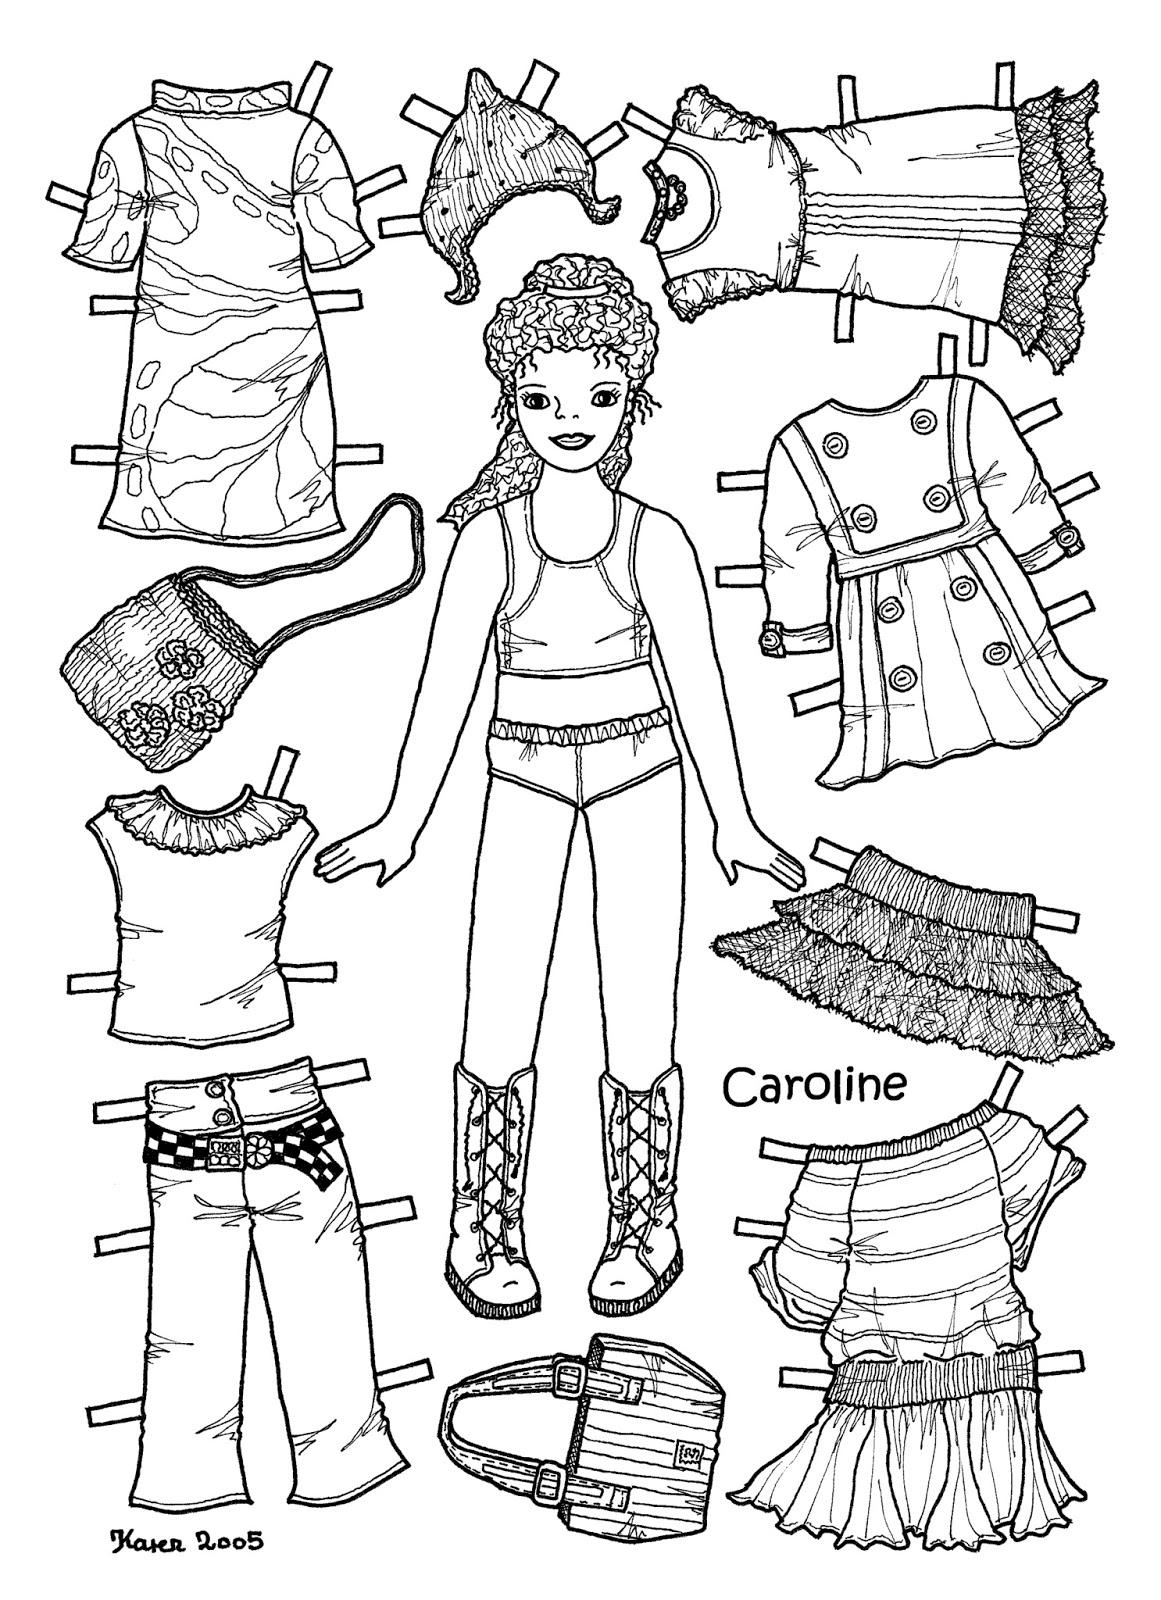 Karen`s Paper Dolls: Caroline 1-6 Paper Doll to Colour